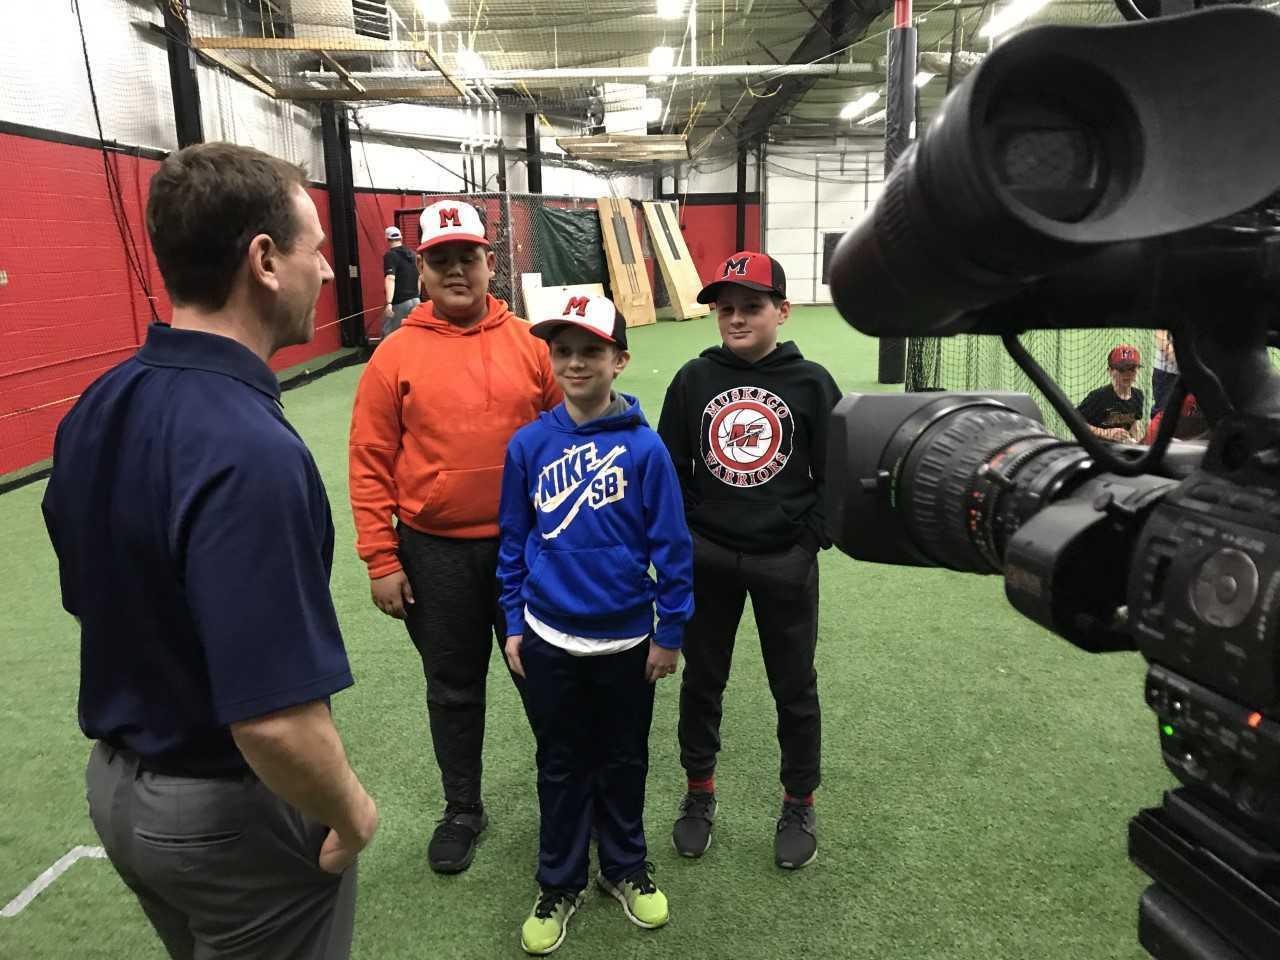 Vince Vitrano interviews muskego warriors U-12